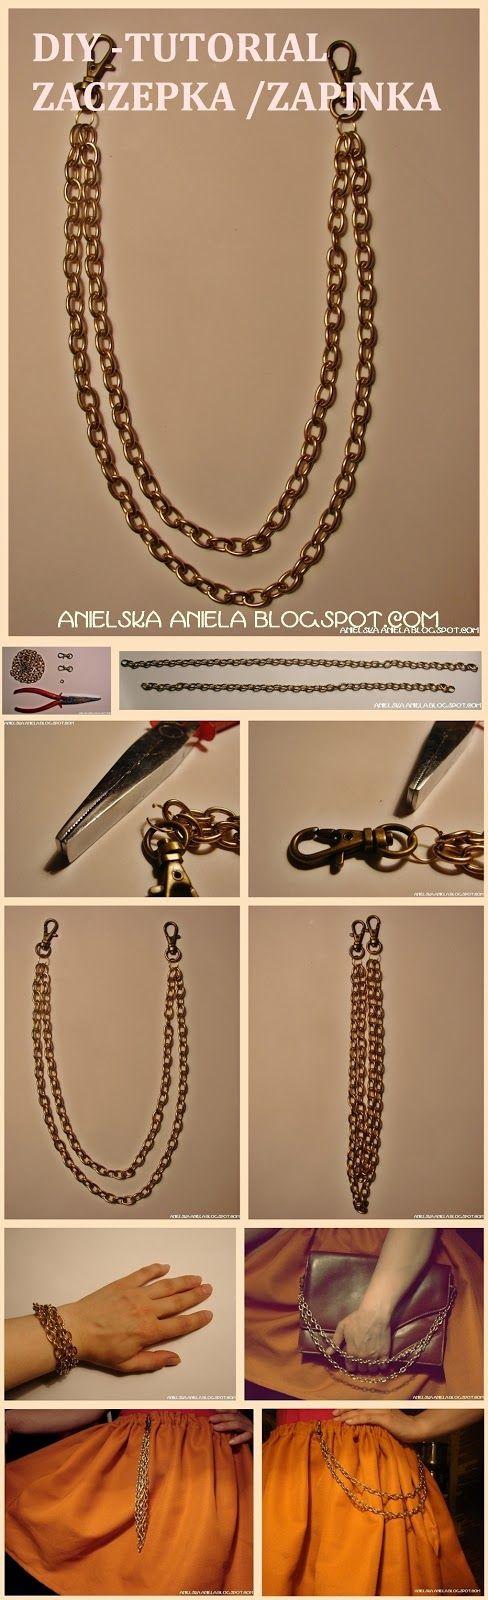 diy chain jewellery tutorial